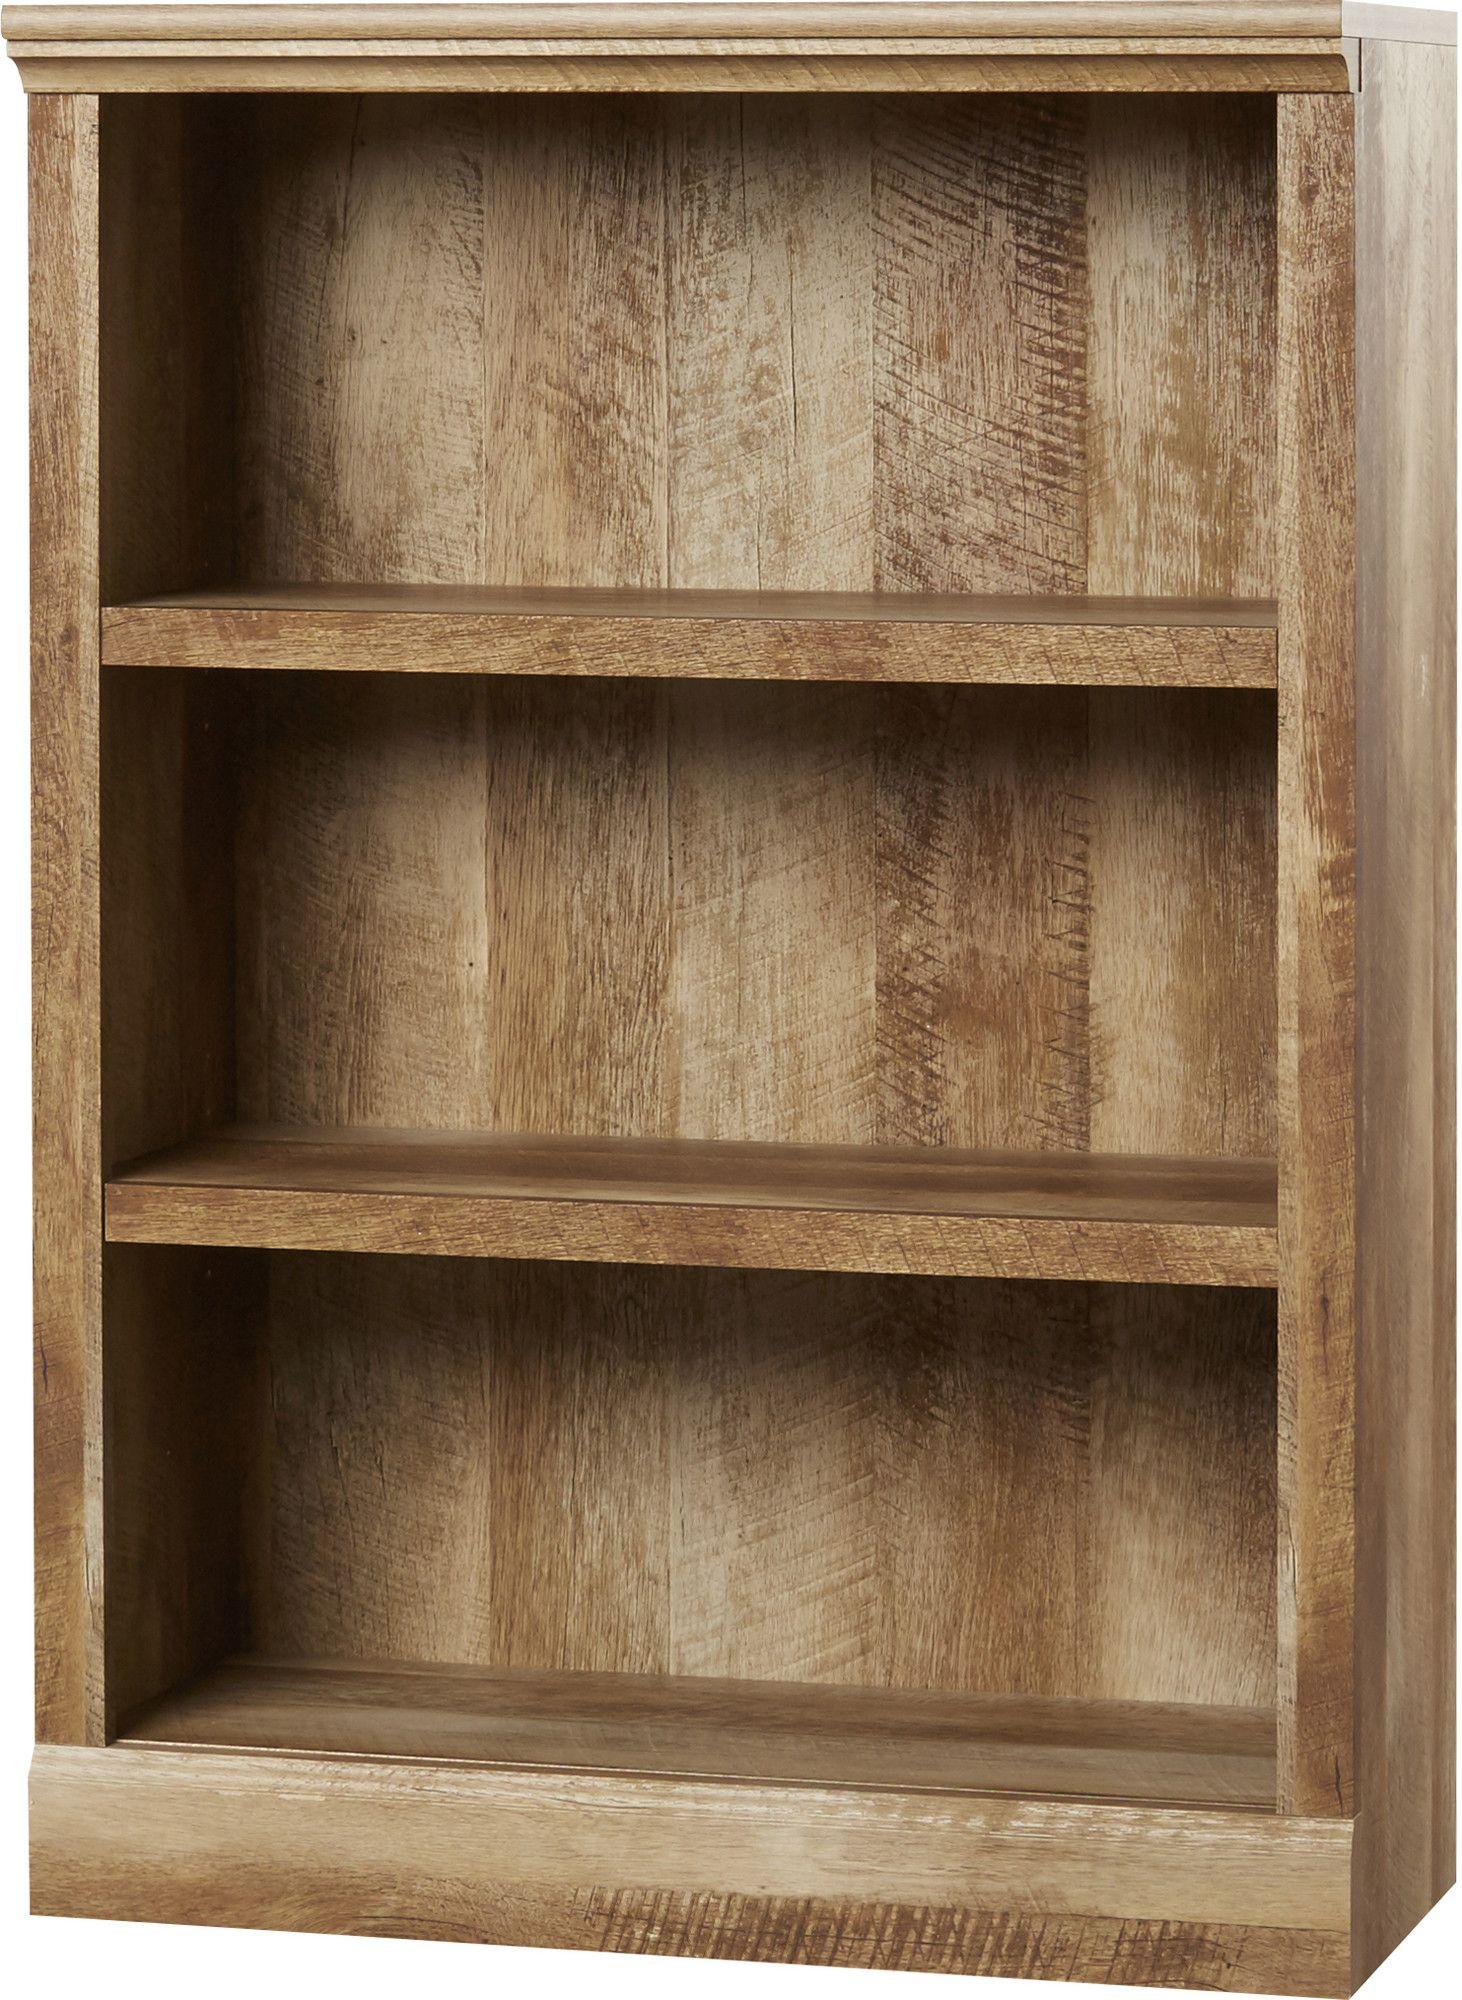 Elencourt Standard Bookcase Bookcase Shelves Scarf Organization